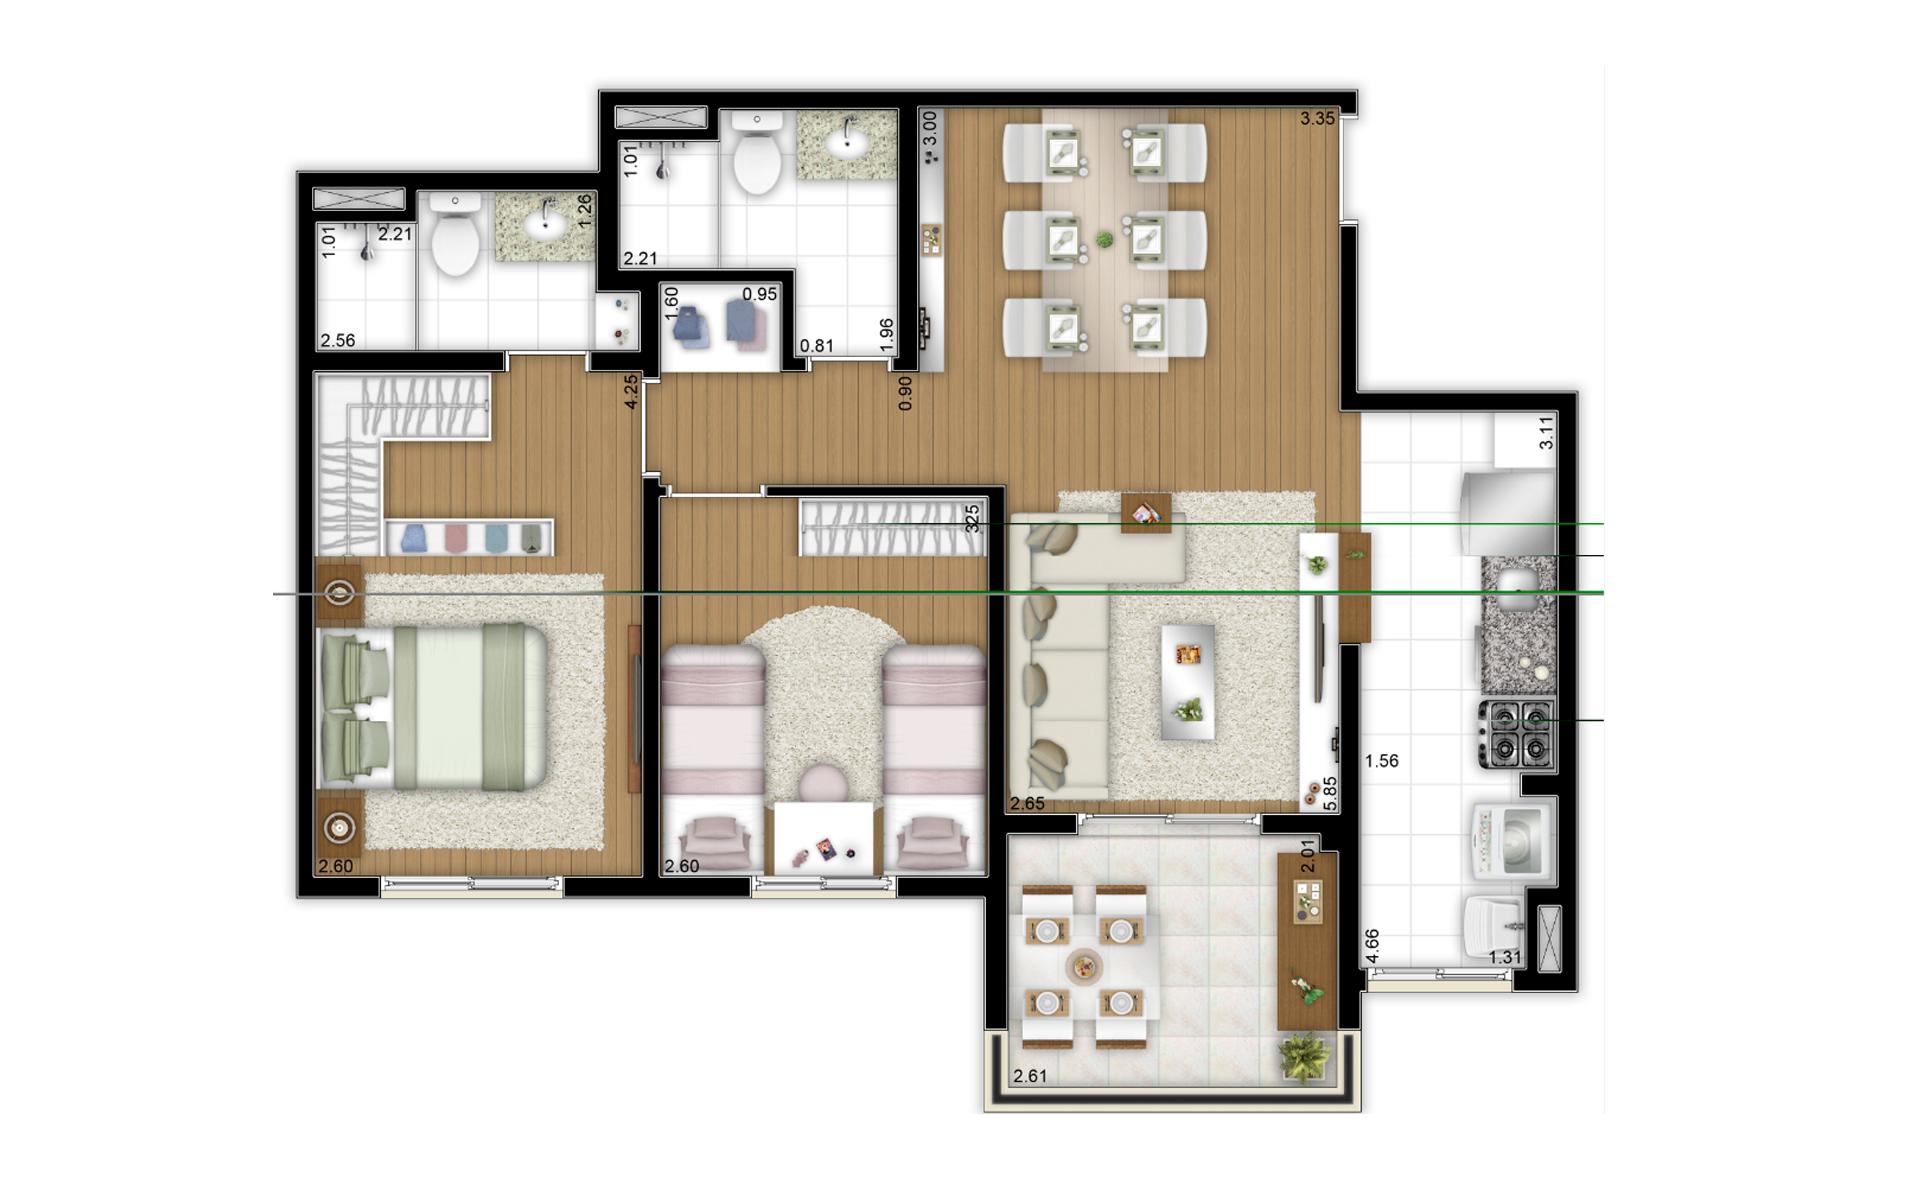 68,07 m² - 2 dorms (1 suíte) - Torre A - Apto meio